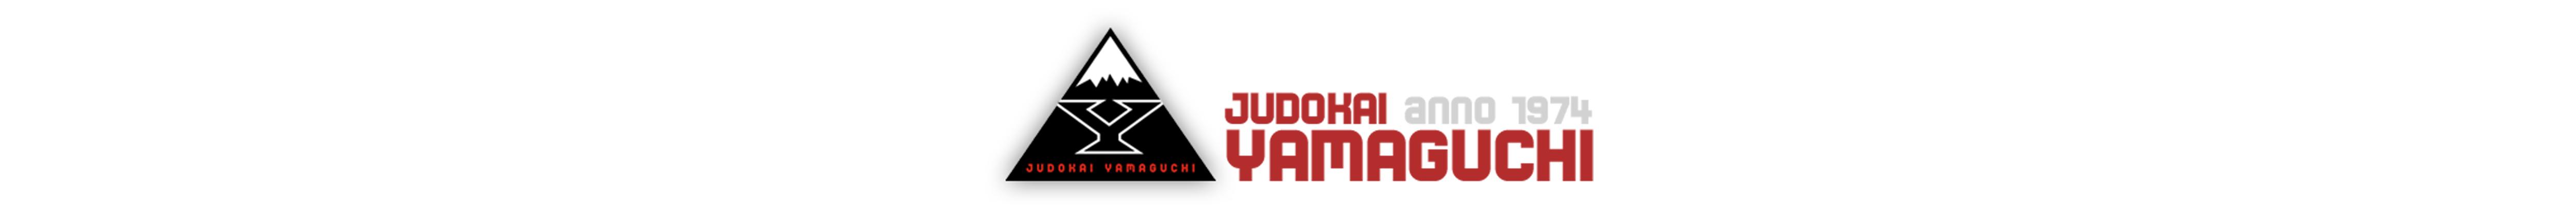 Webshop van Judokai Yamaguchi